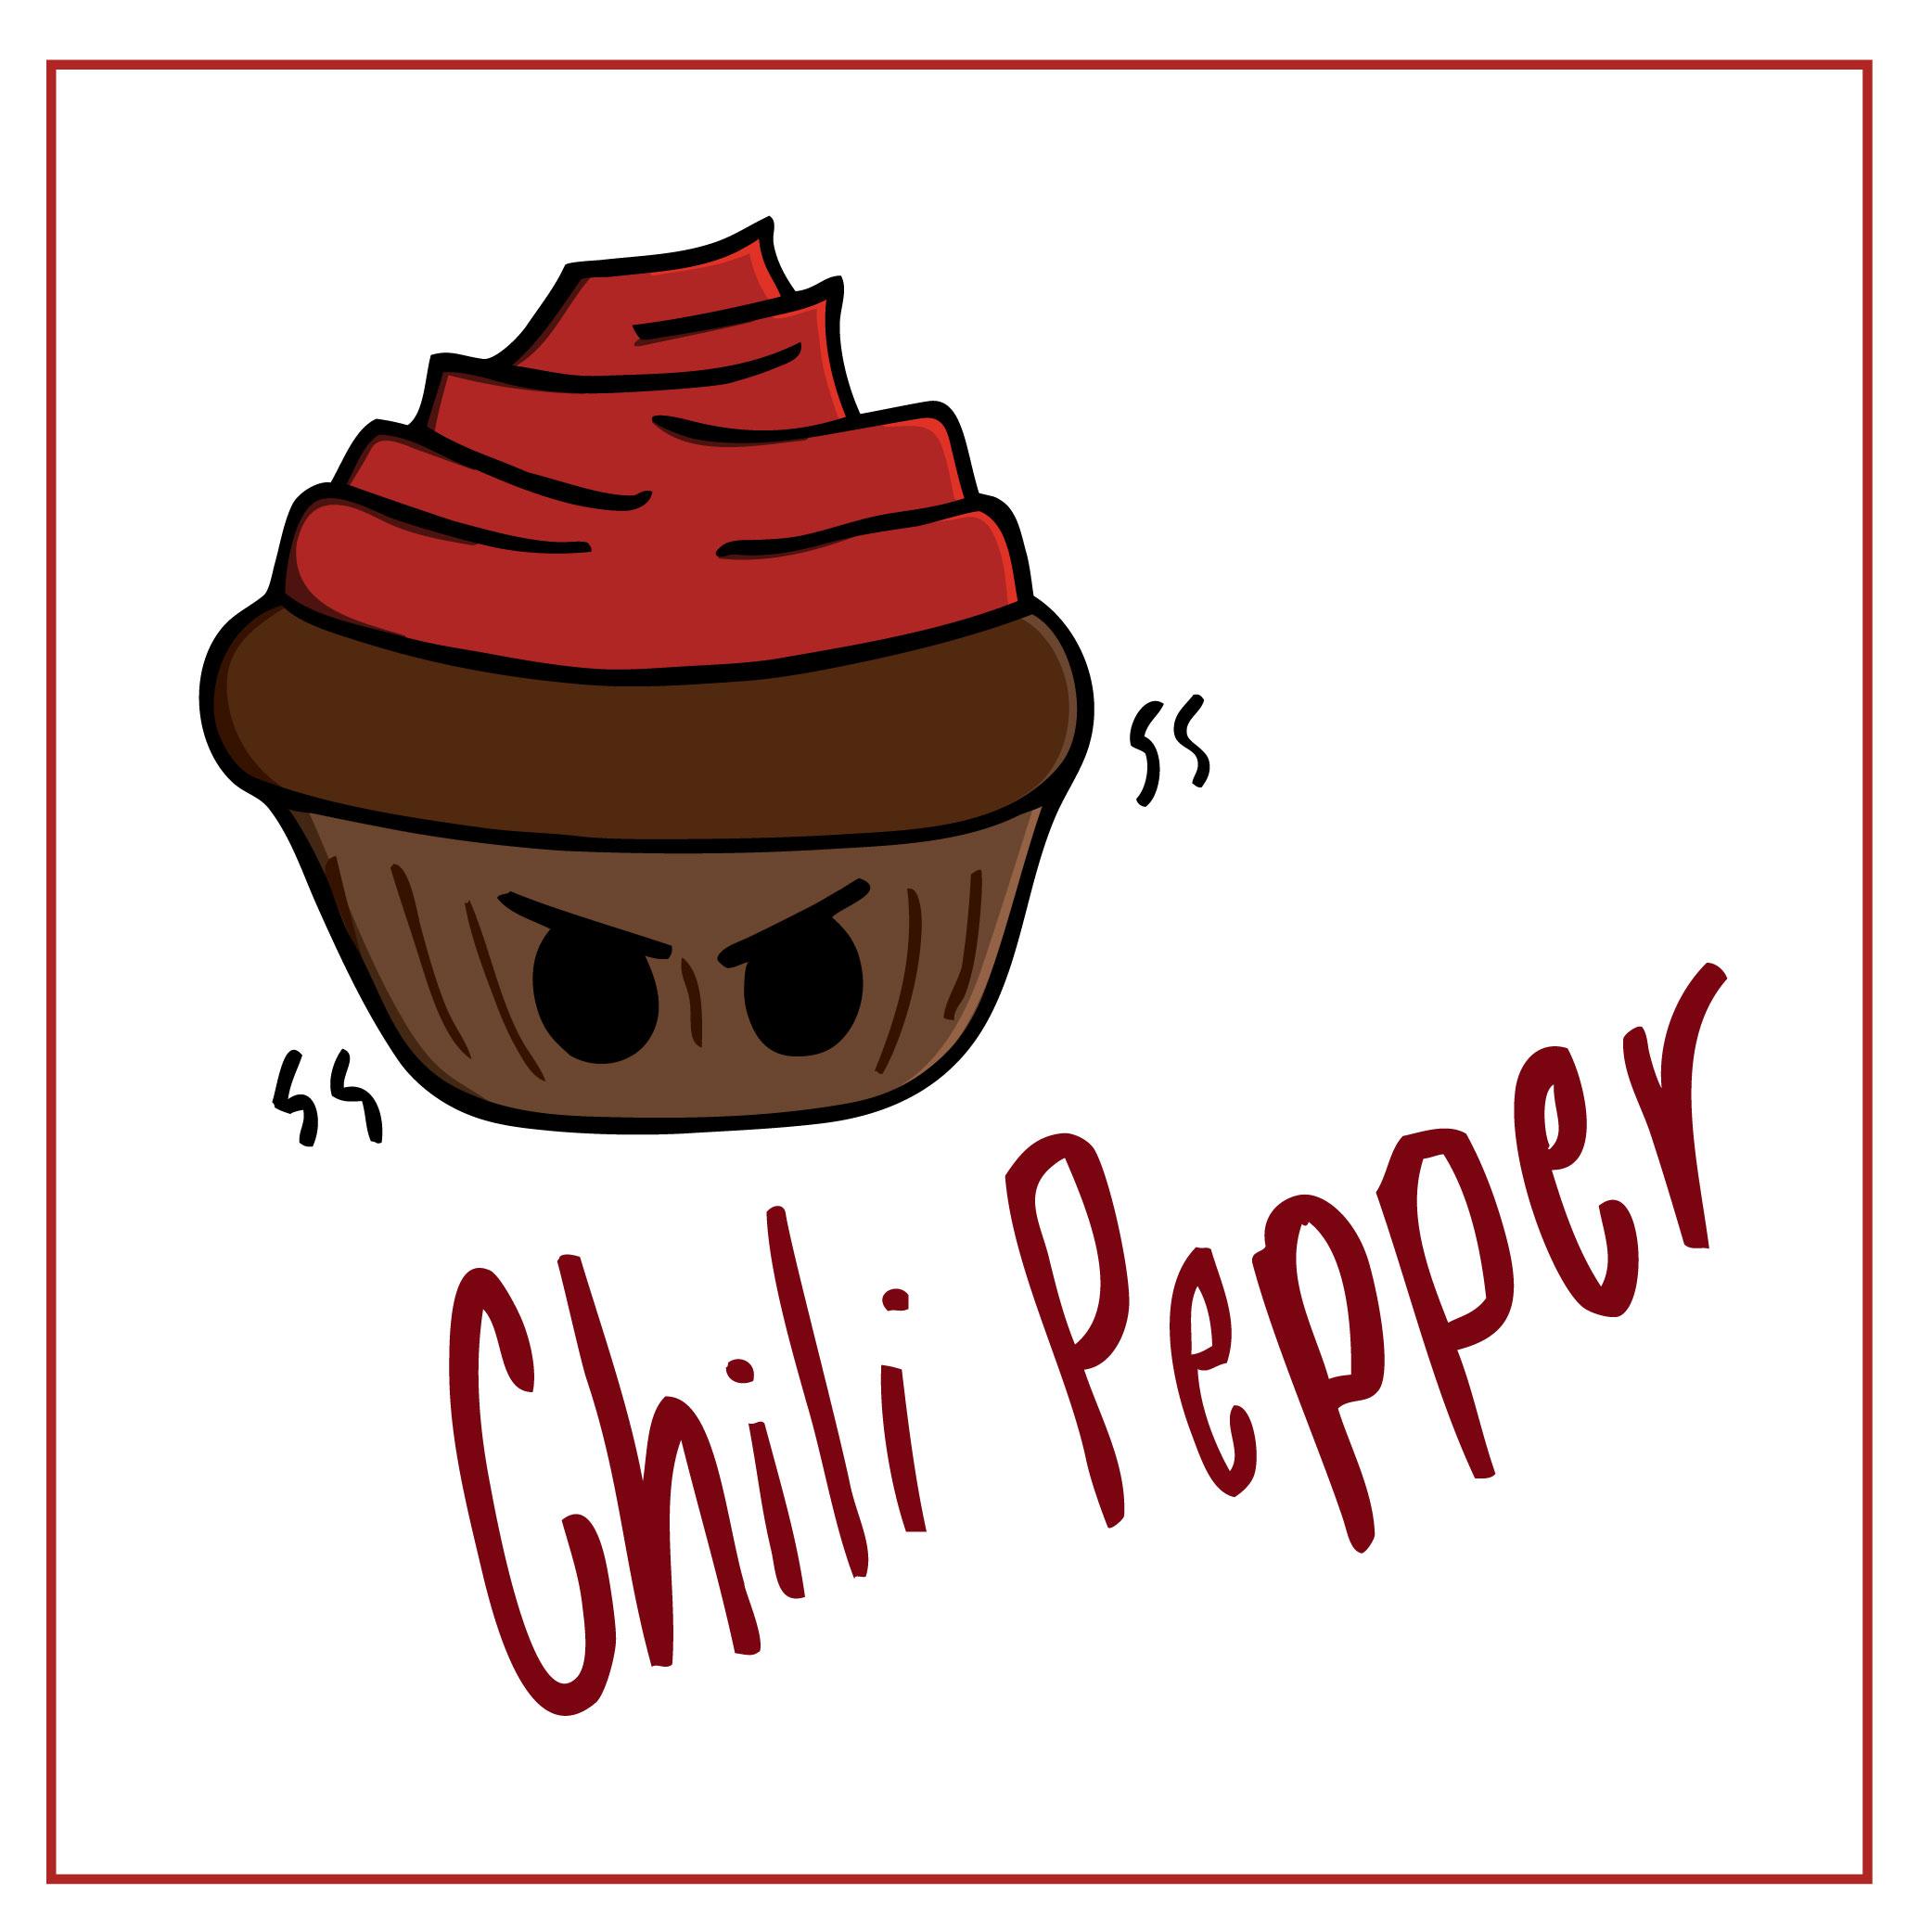 Chili-Pepper-Squared-01.jpg